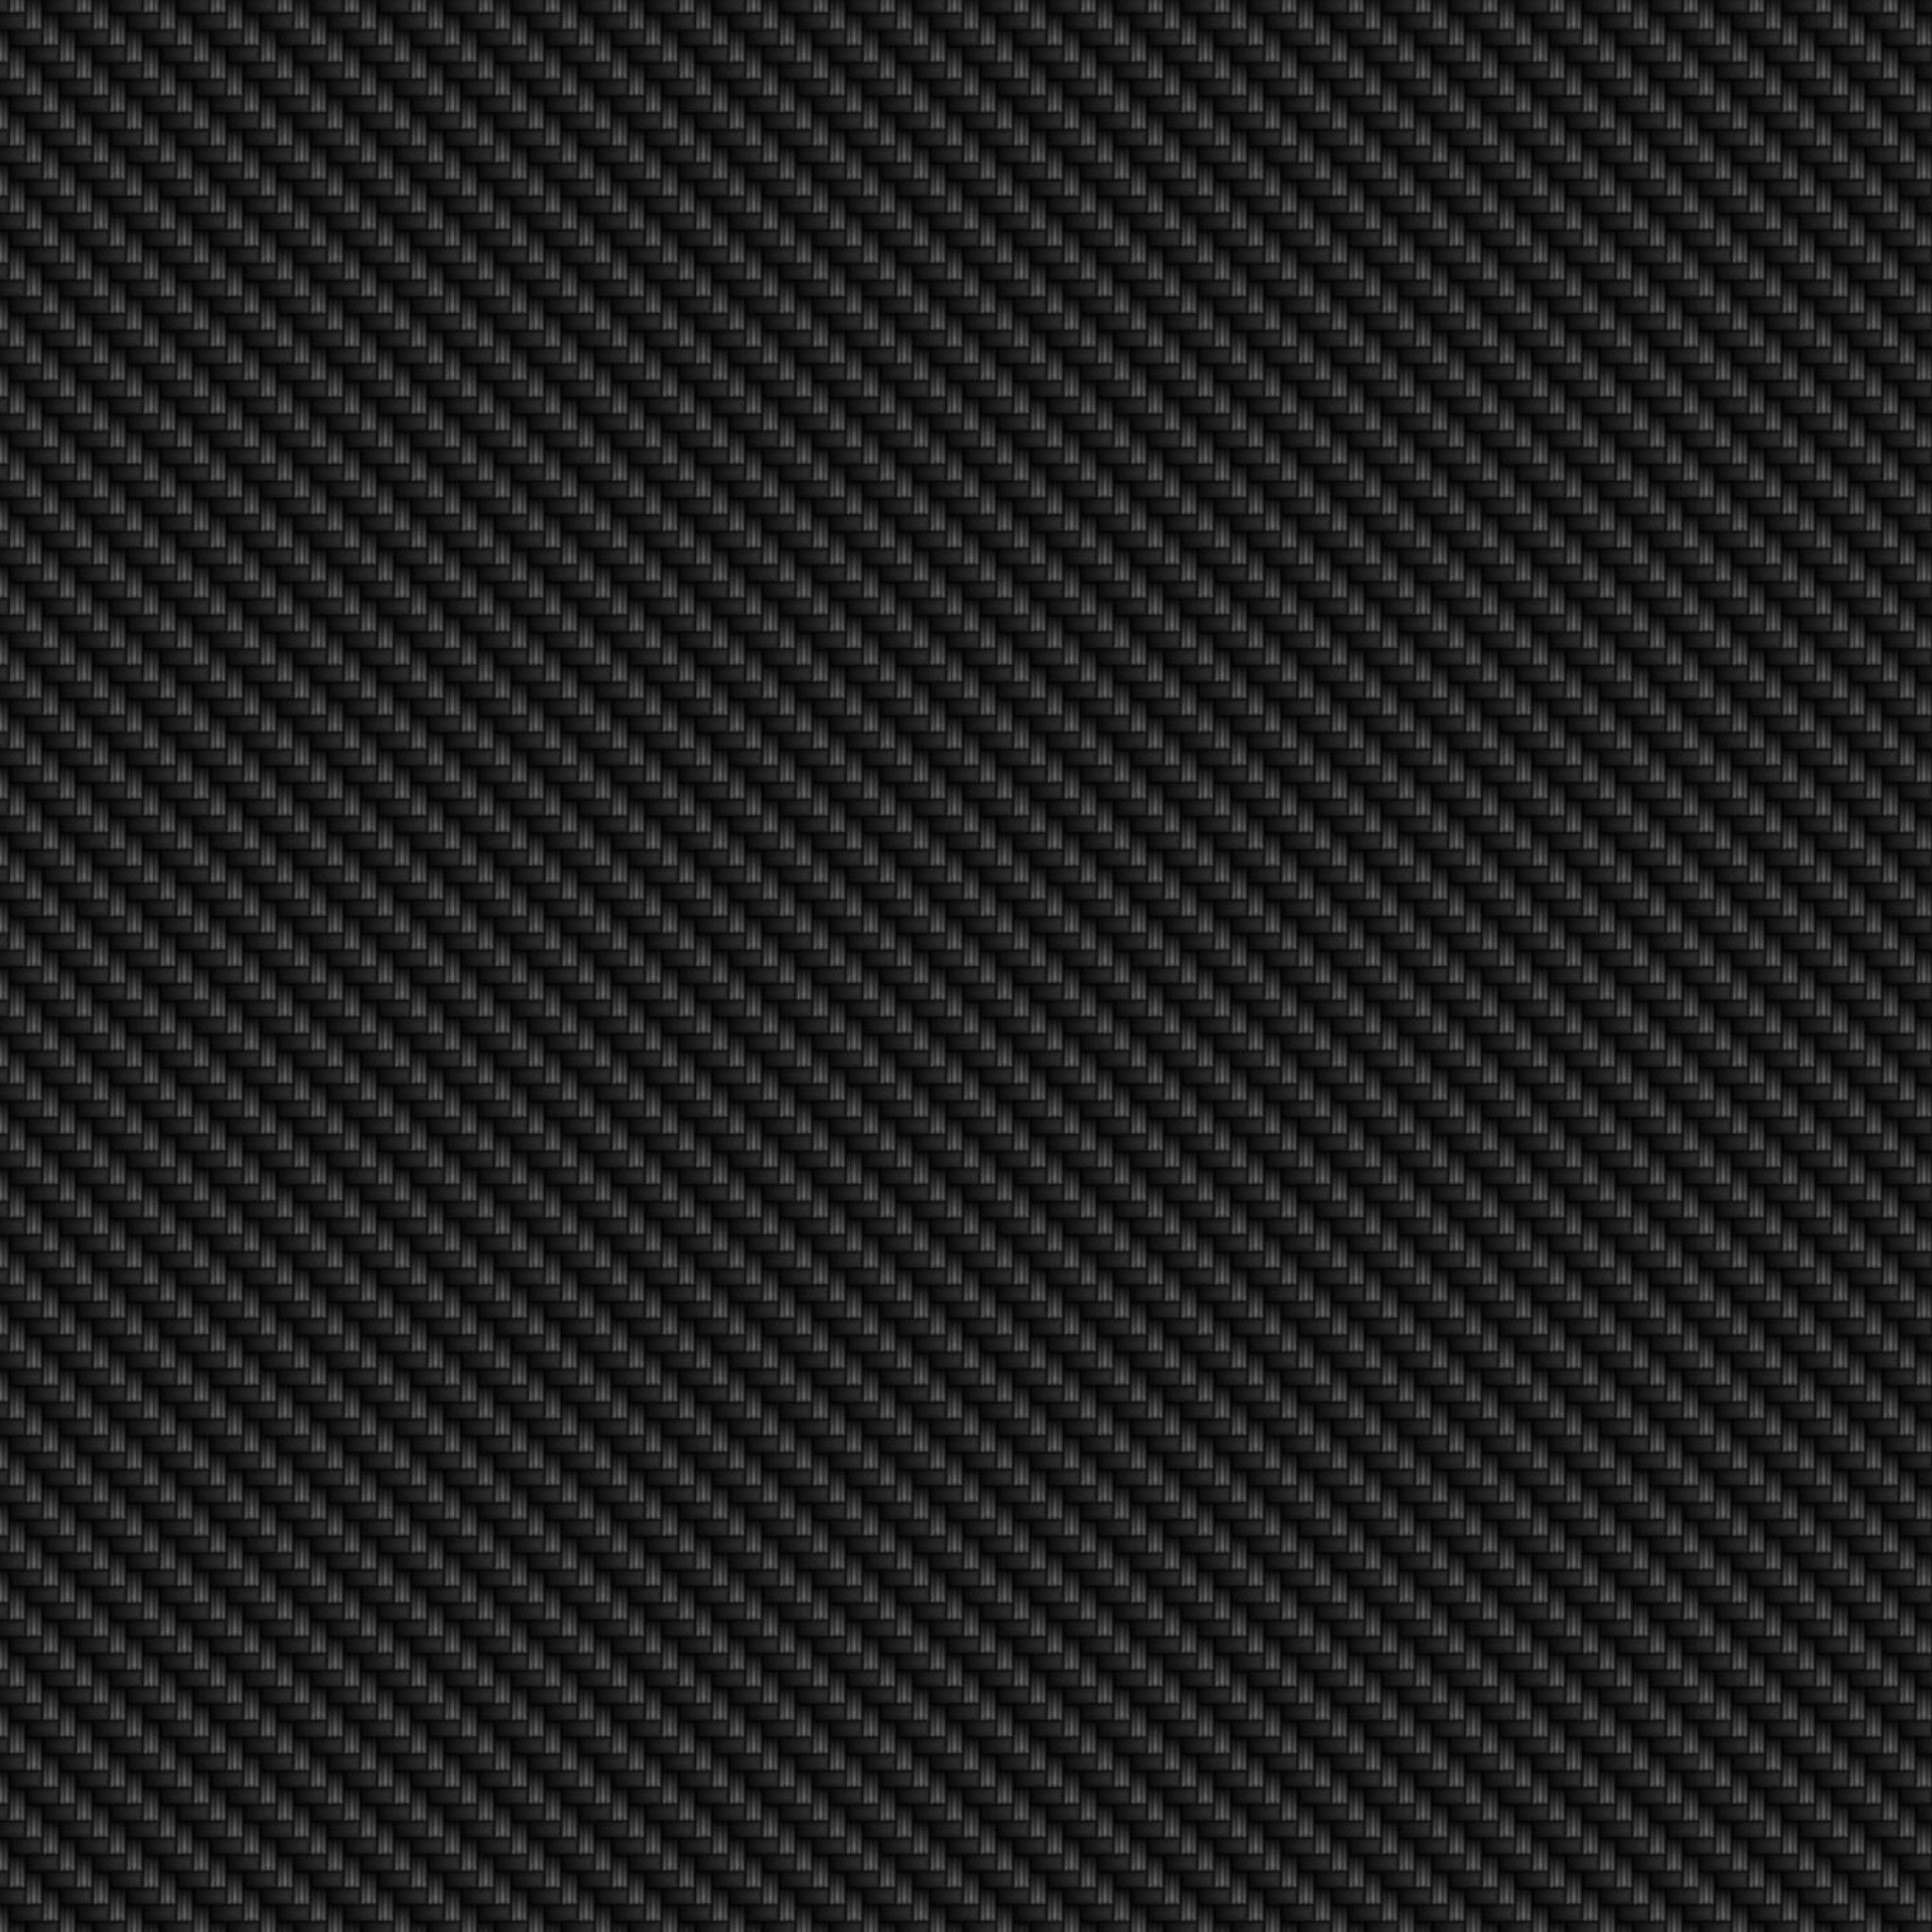 4k Carbon Fiber Wallpapers Top Free 4k Carbon Fiber Backgrounds Wallpaperaccess Carbon Fiber Wallpaper Carbon Fiber Industrial Fabric